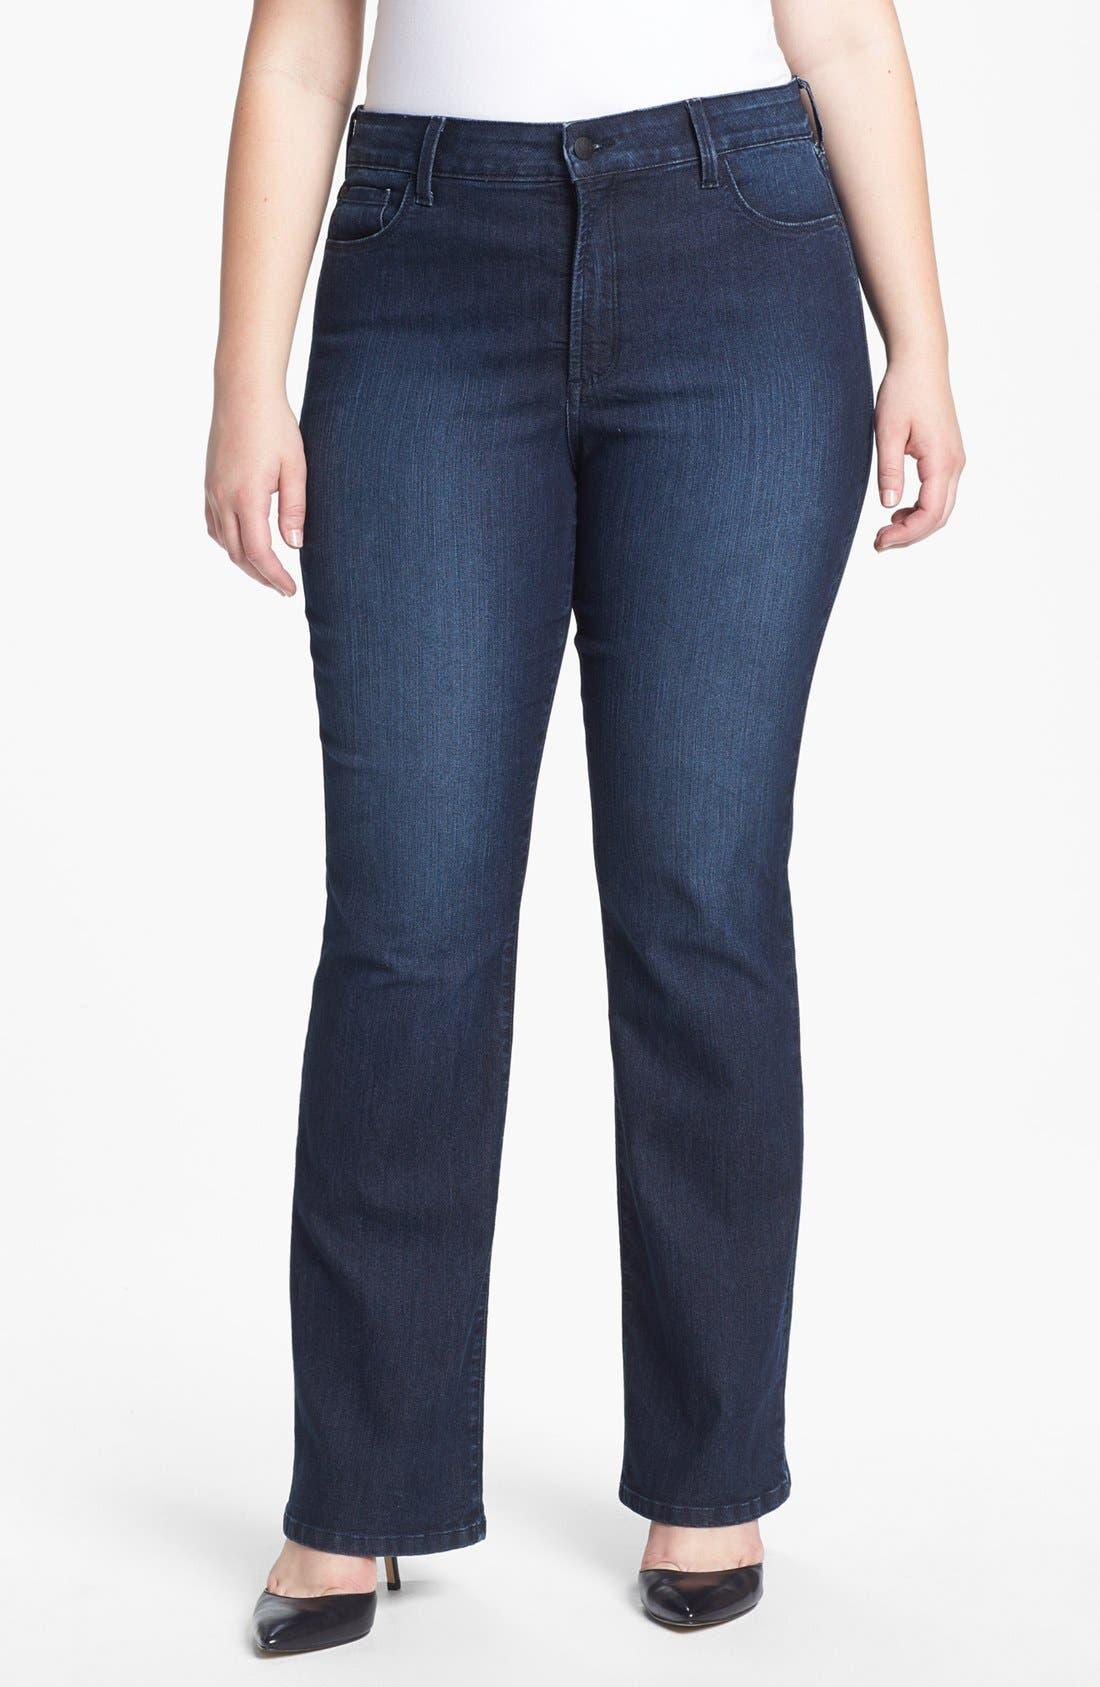 Alternate Image 1 Selected - NYDJ 'Barbara' Bootcut Jeans (Dana Point) (Plus Size)